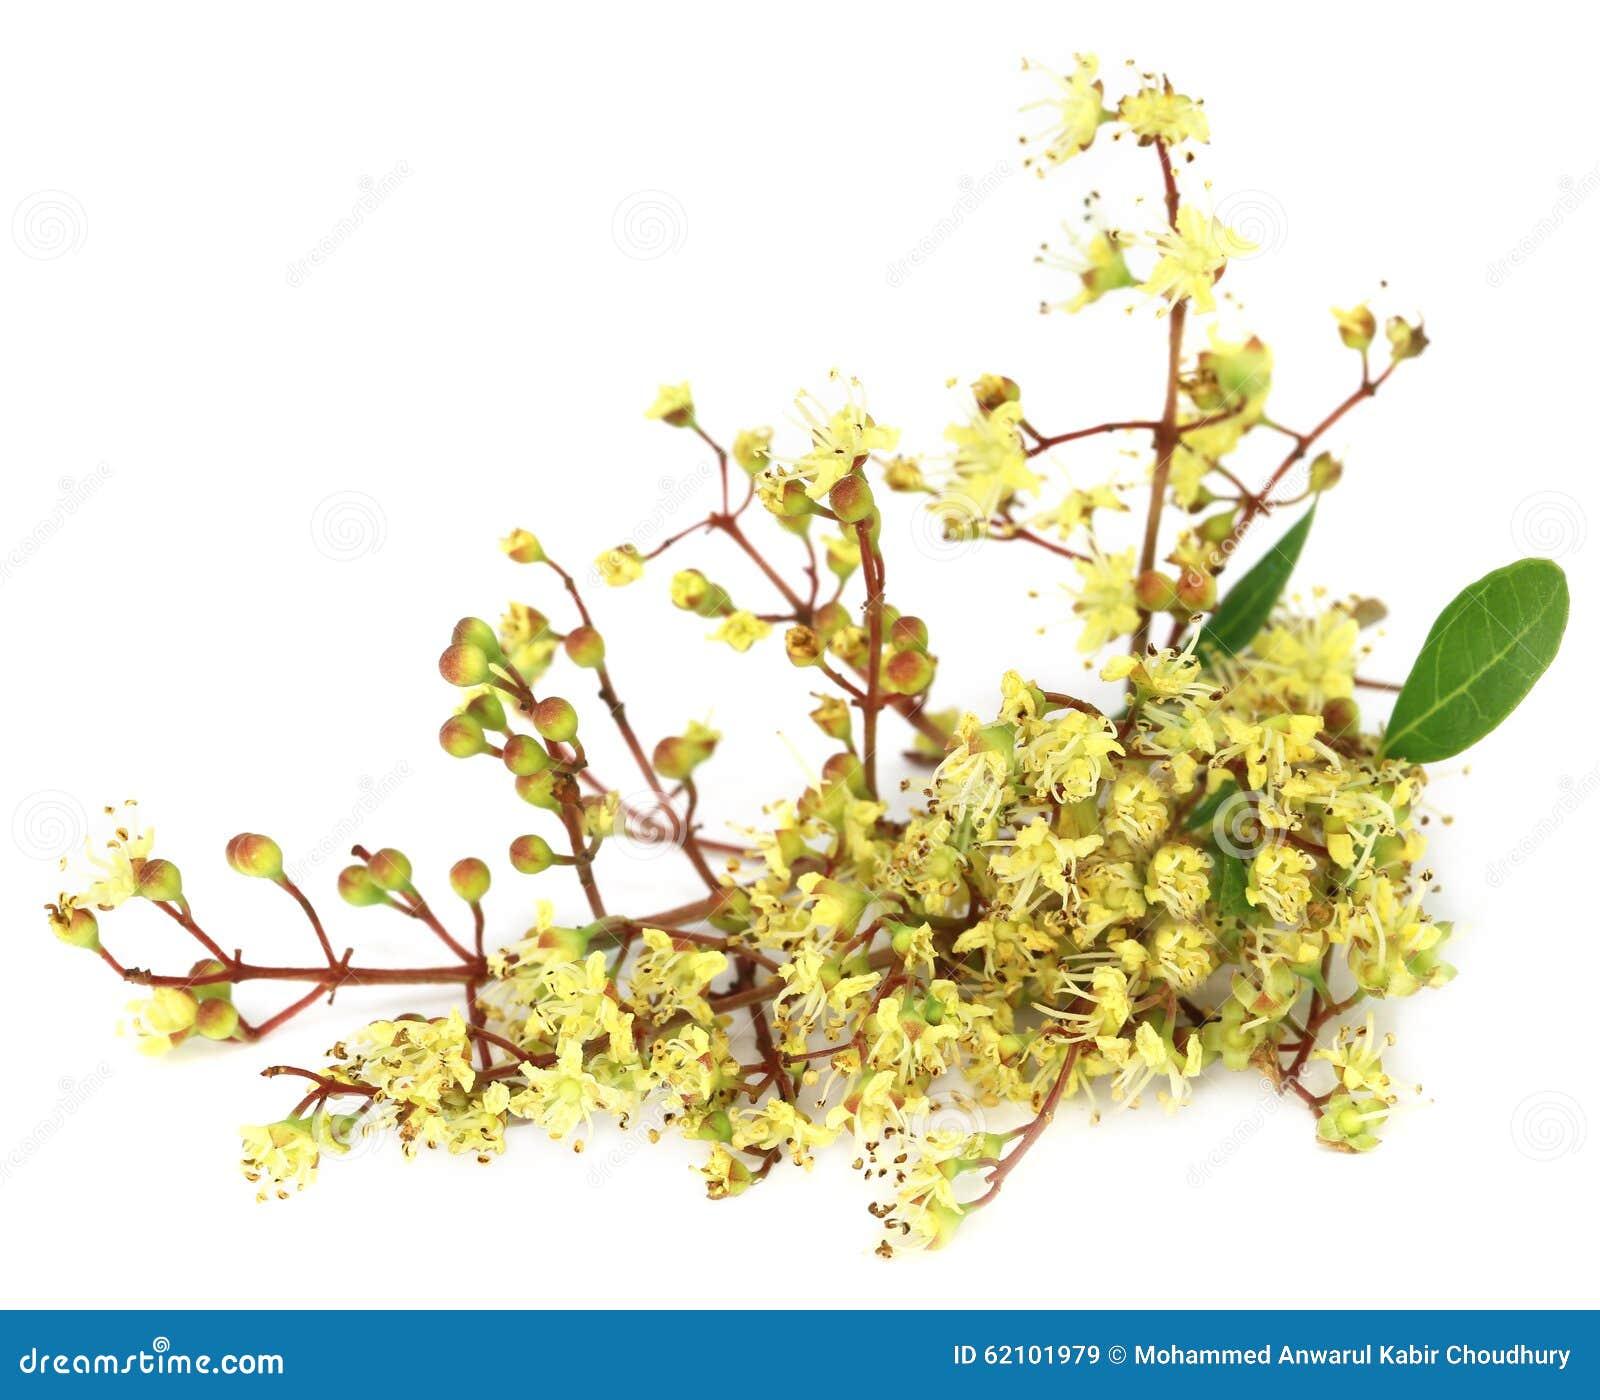 Ayurvedic Henna Flower Stock Image Image Of Nature Leaves 62101979